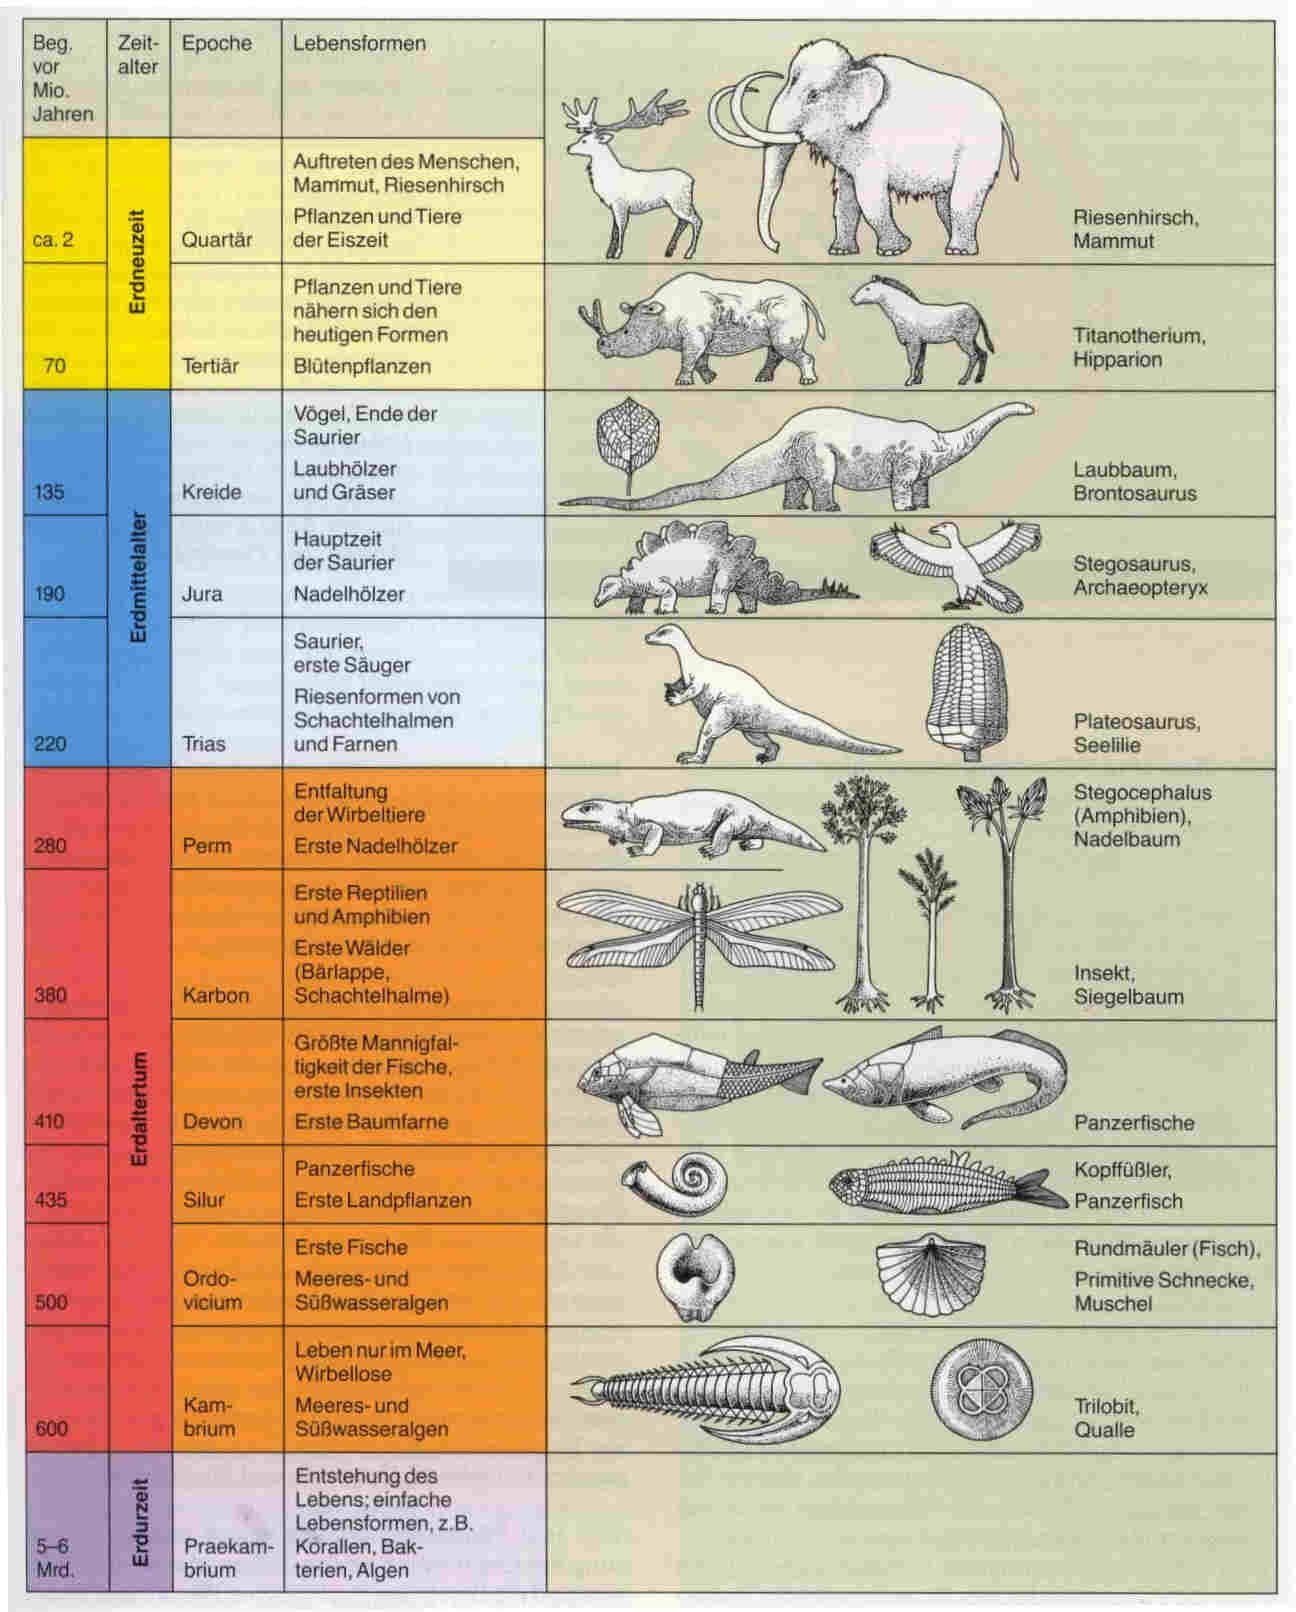 fossilien zeittafel Google Search